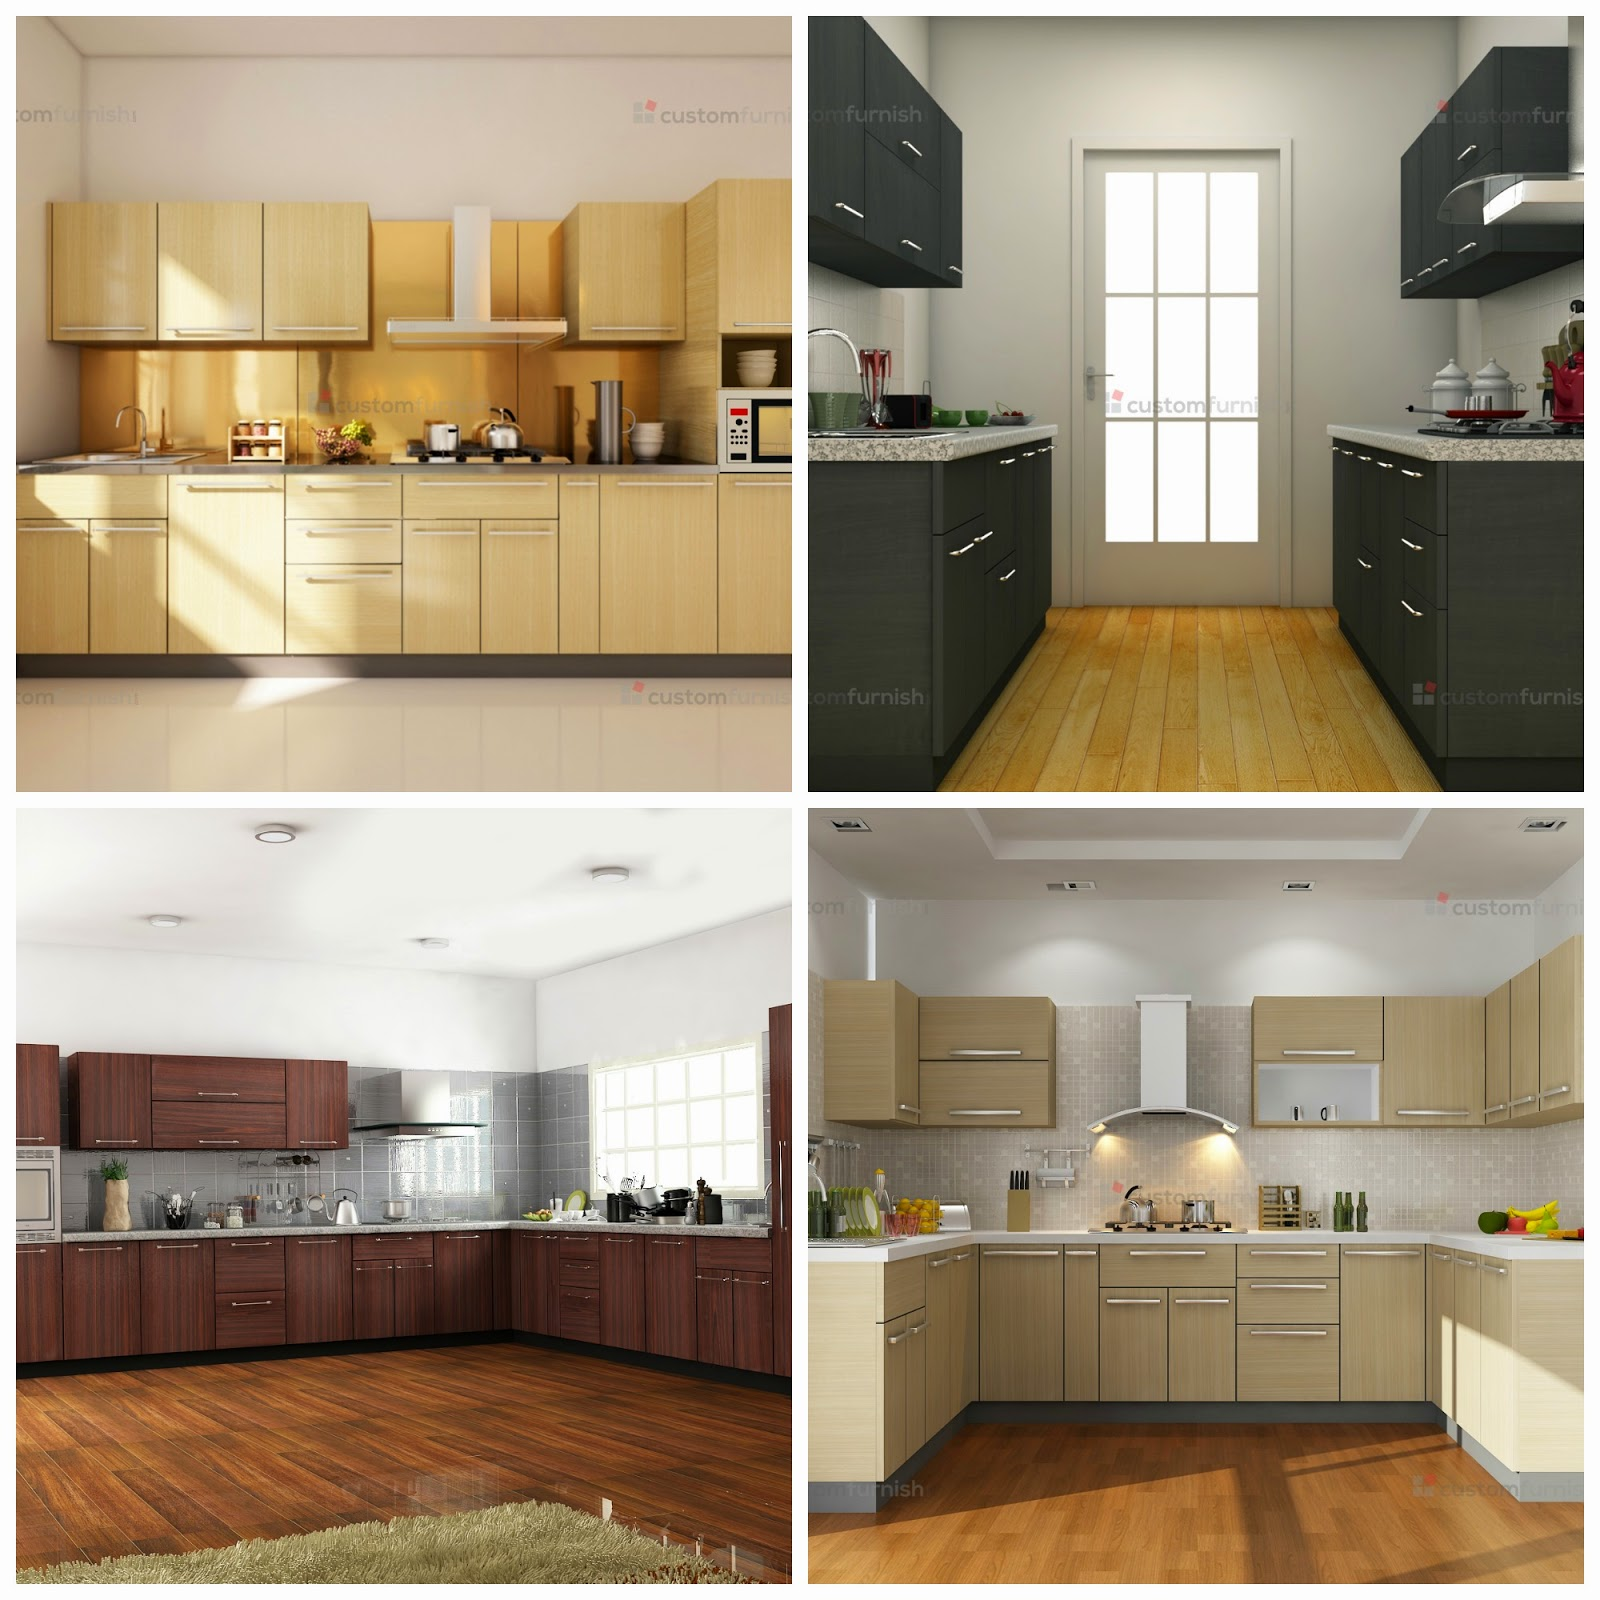 Parallel Kitchen Modular Kitchens Buying Guide Interior Decor Blog